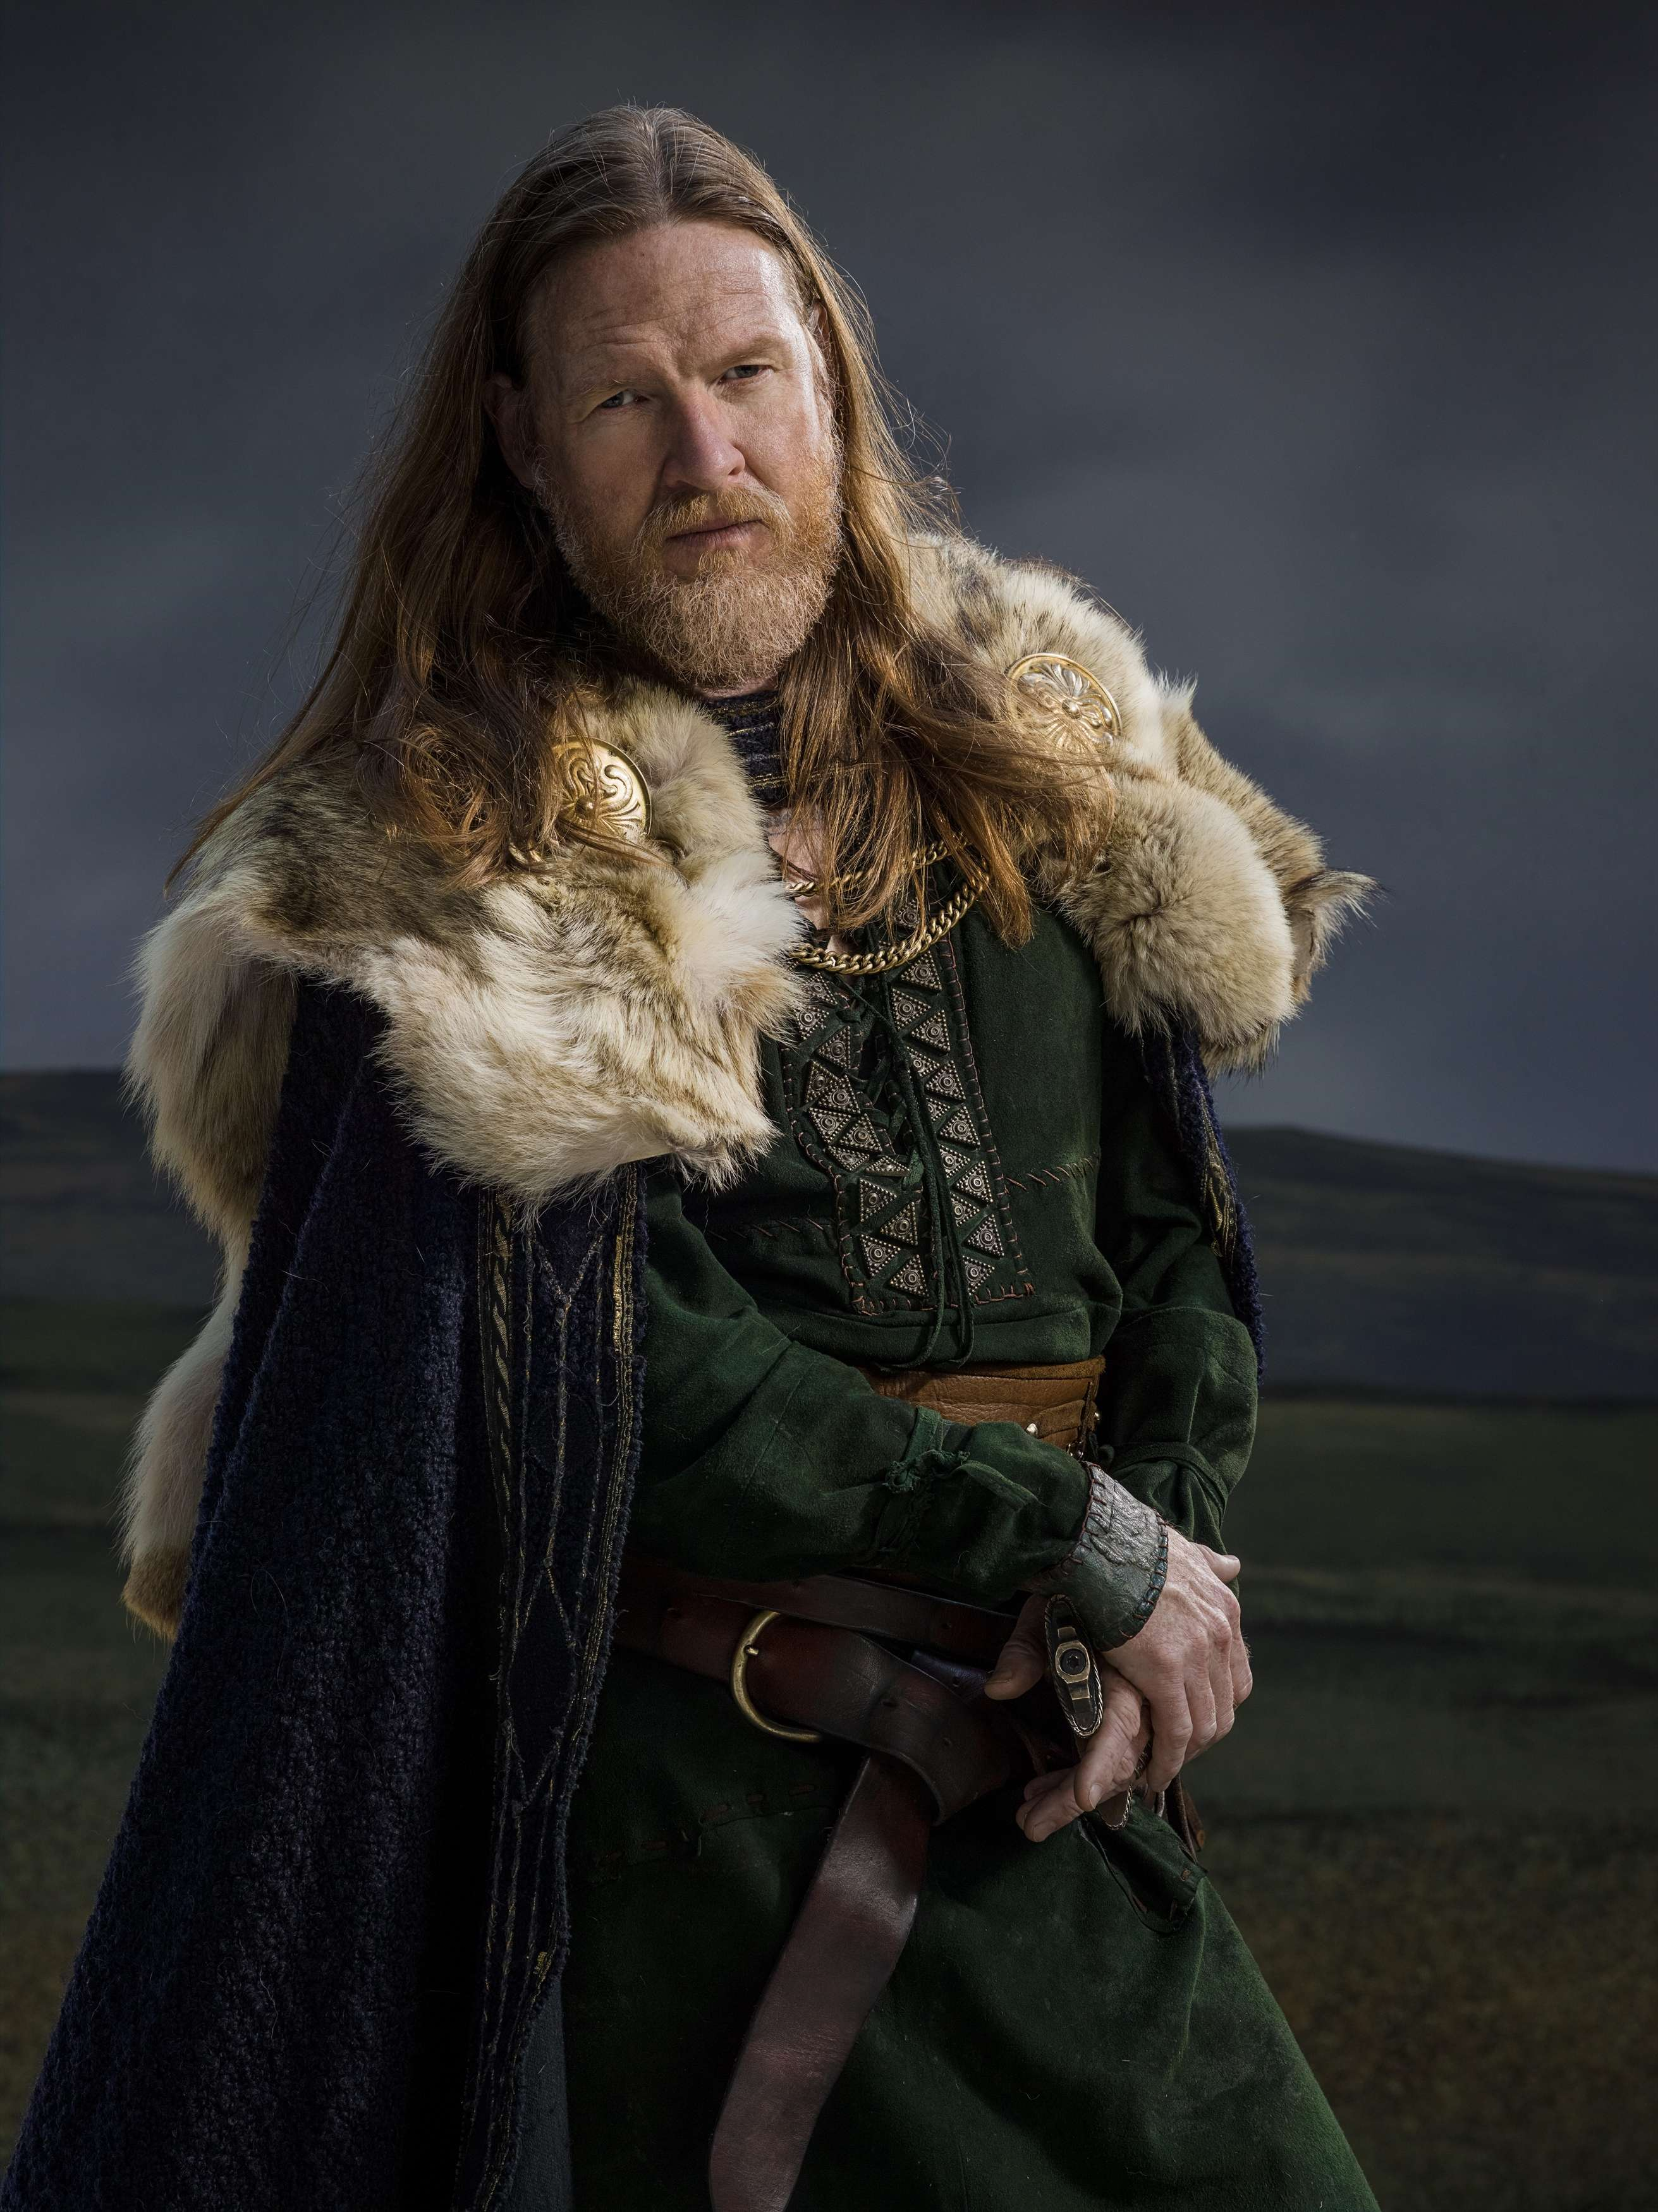 Vikings King Horik